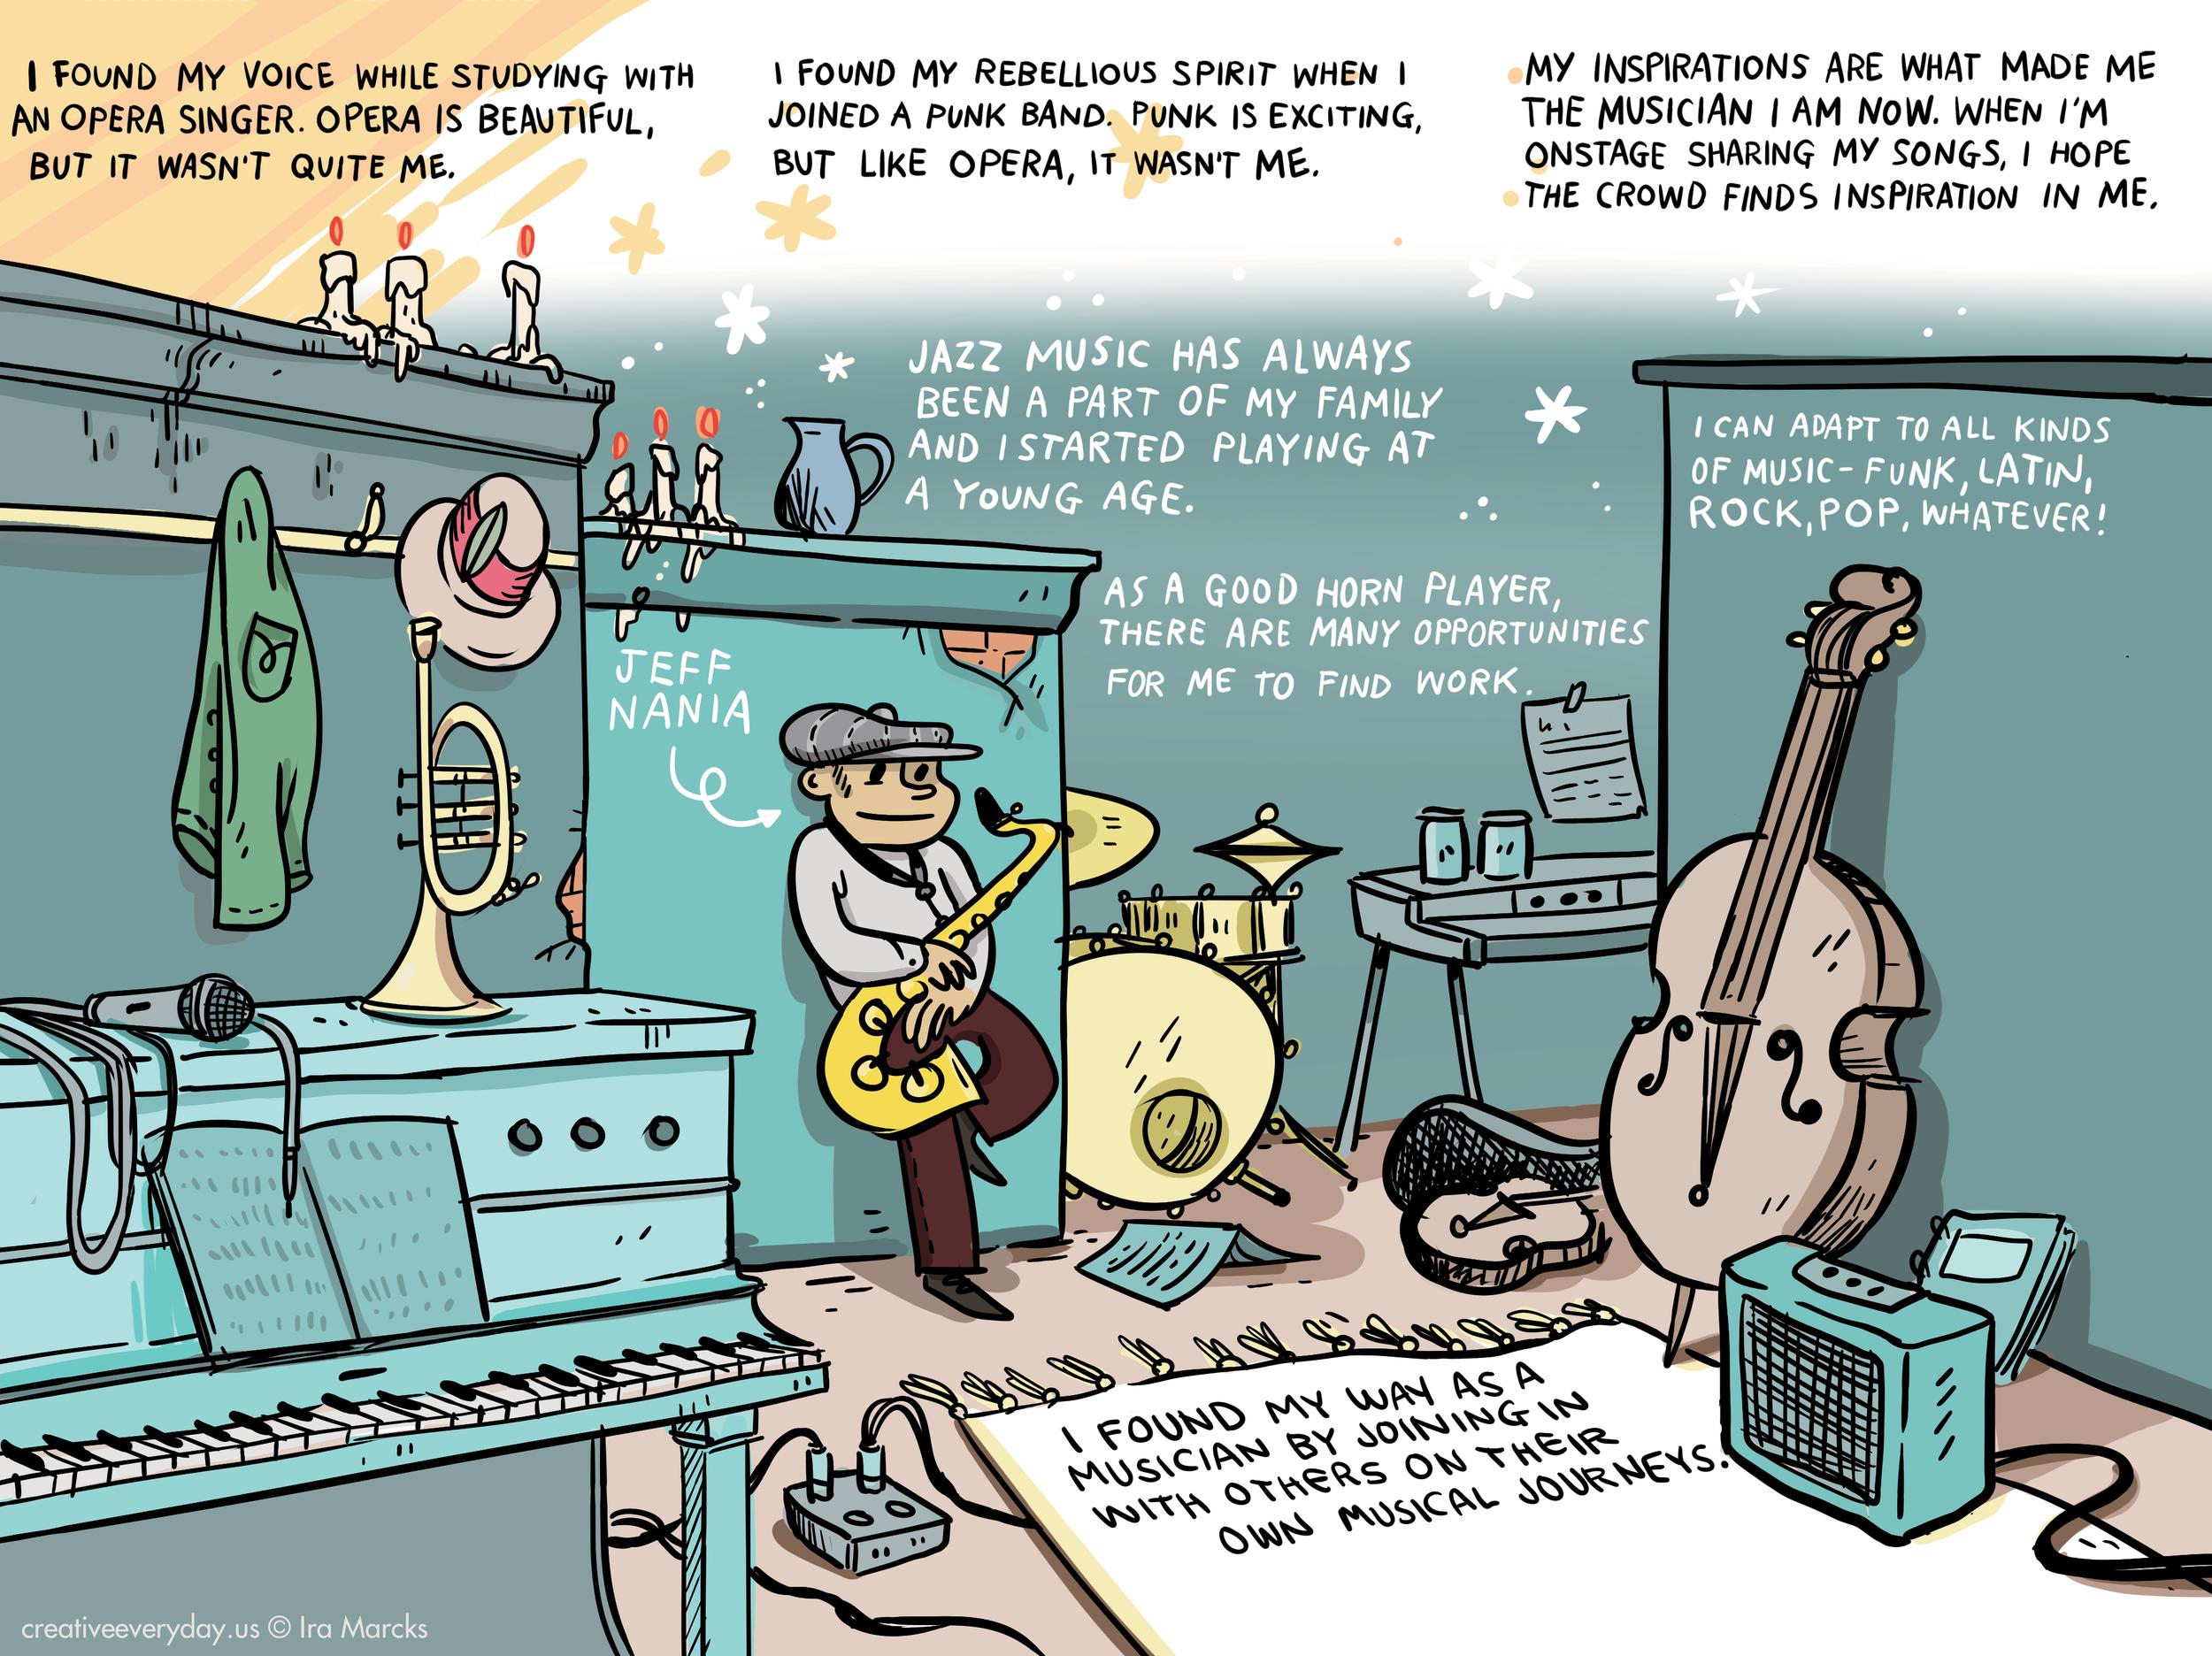 Jeff / Saxophonist